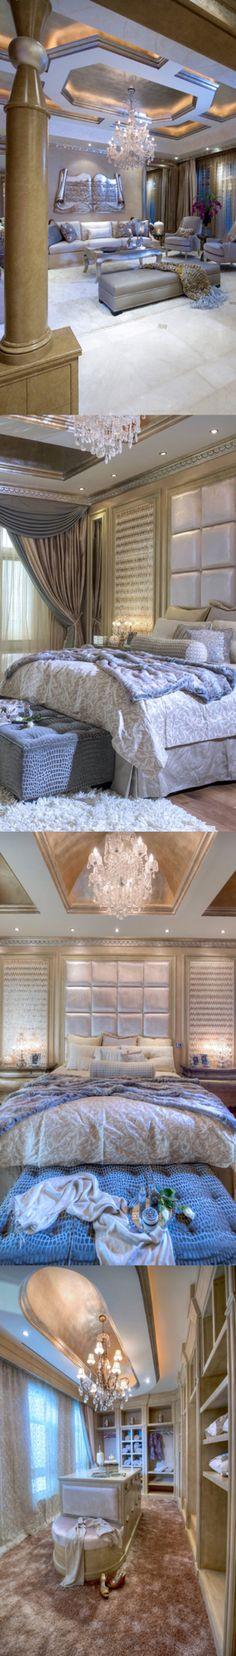 #LuxuryBedrooms#Mansions #Estates #Luxurydotcom